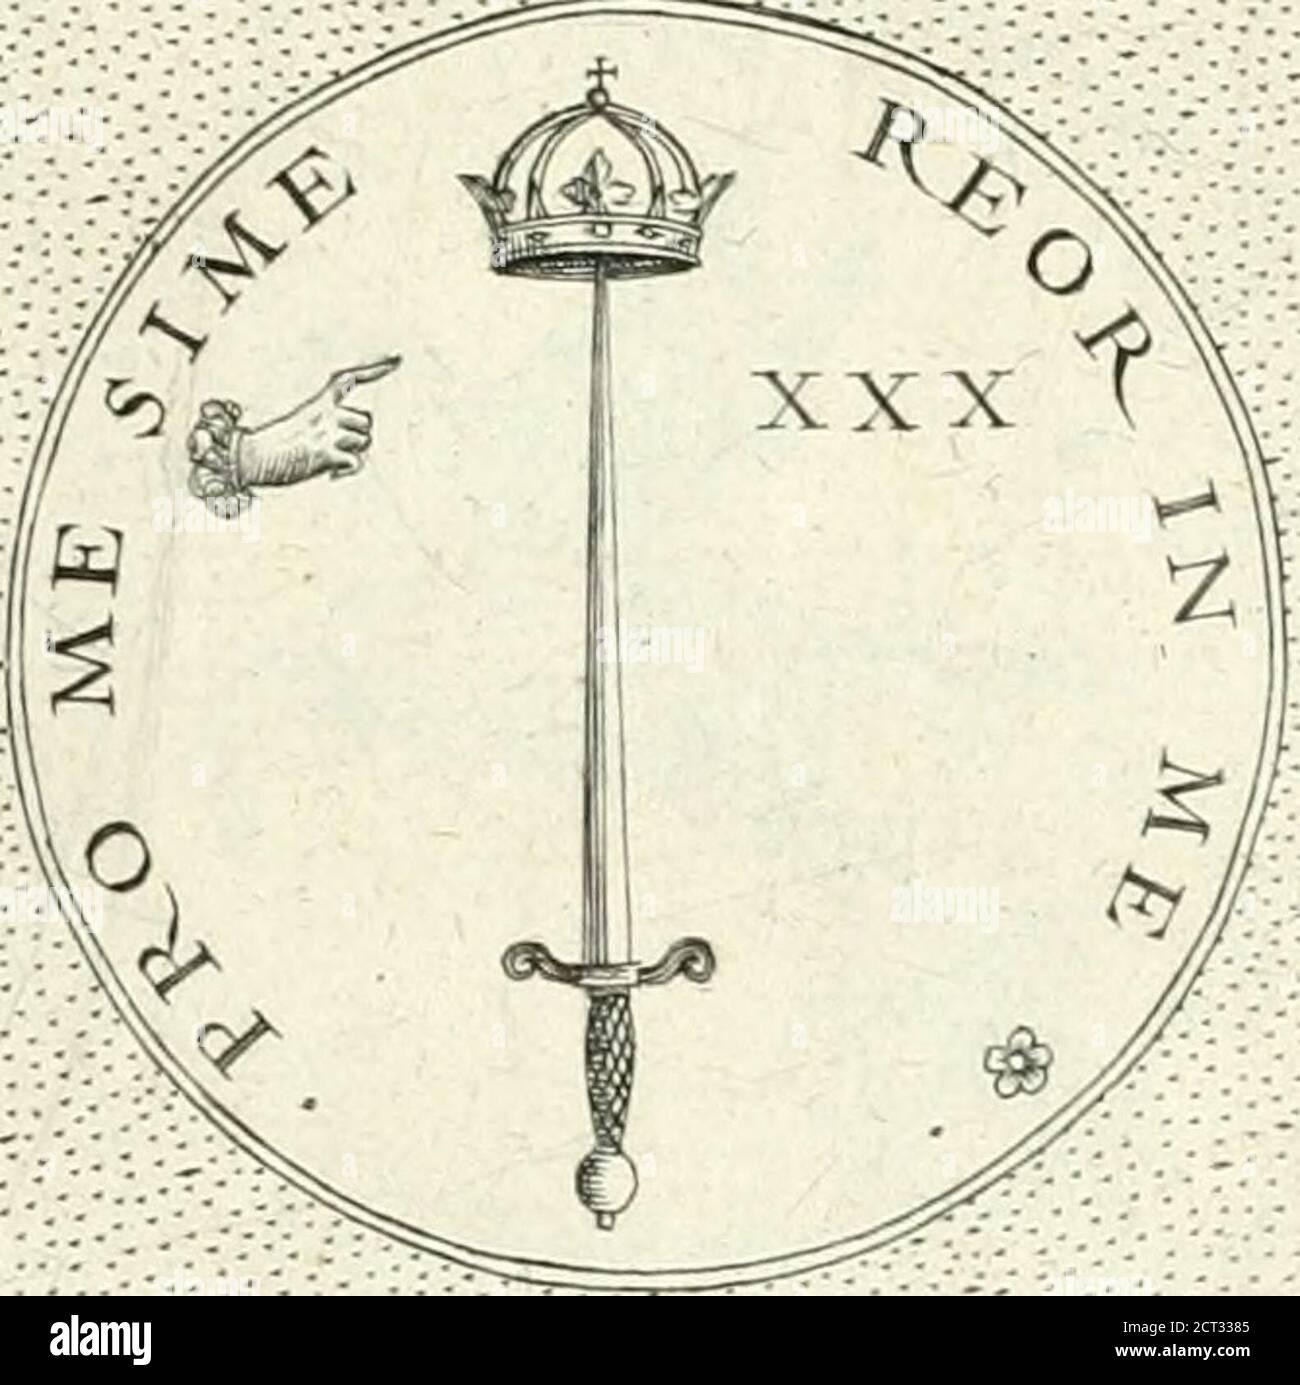 . Symbola diuina & humana pontificvm, imperatorvm, regvm : accessit breuis & facis isagoge IAC. Typotii : ex mvsaeo Octavii de Strada civis Romani : tomus primus[-tertius] .. V--------------------------------------------------------------------------- ■}:-/-;}:-:-:-/;i-V:-;:<:- e l?l?fimsm u/. J?P<7 pies/?a///r. J?h//sus /u/. Ji?TJ o//?a//f. Foto de stock